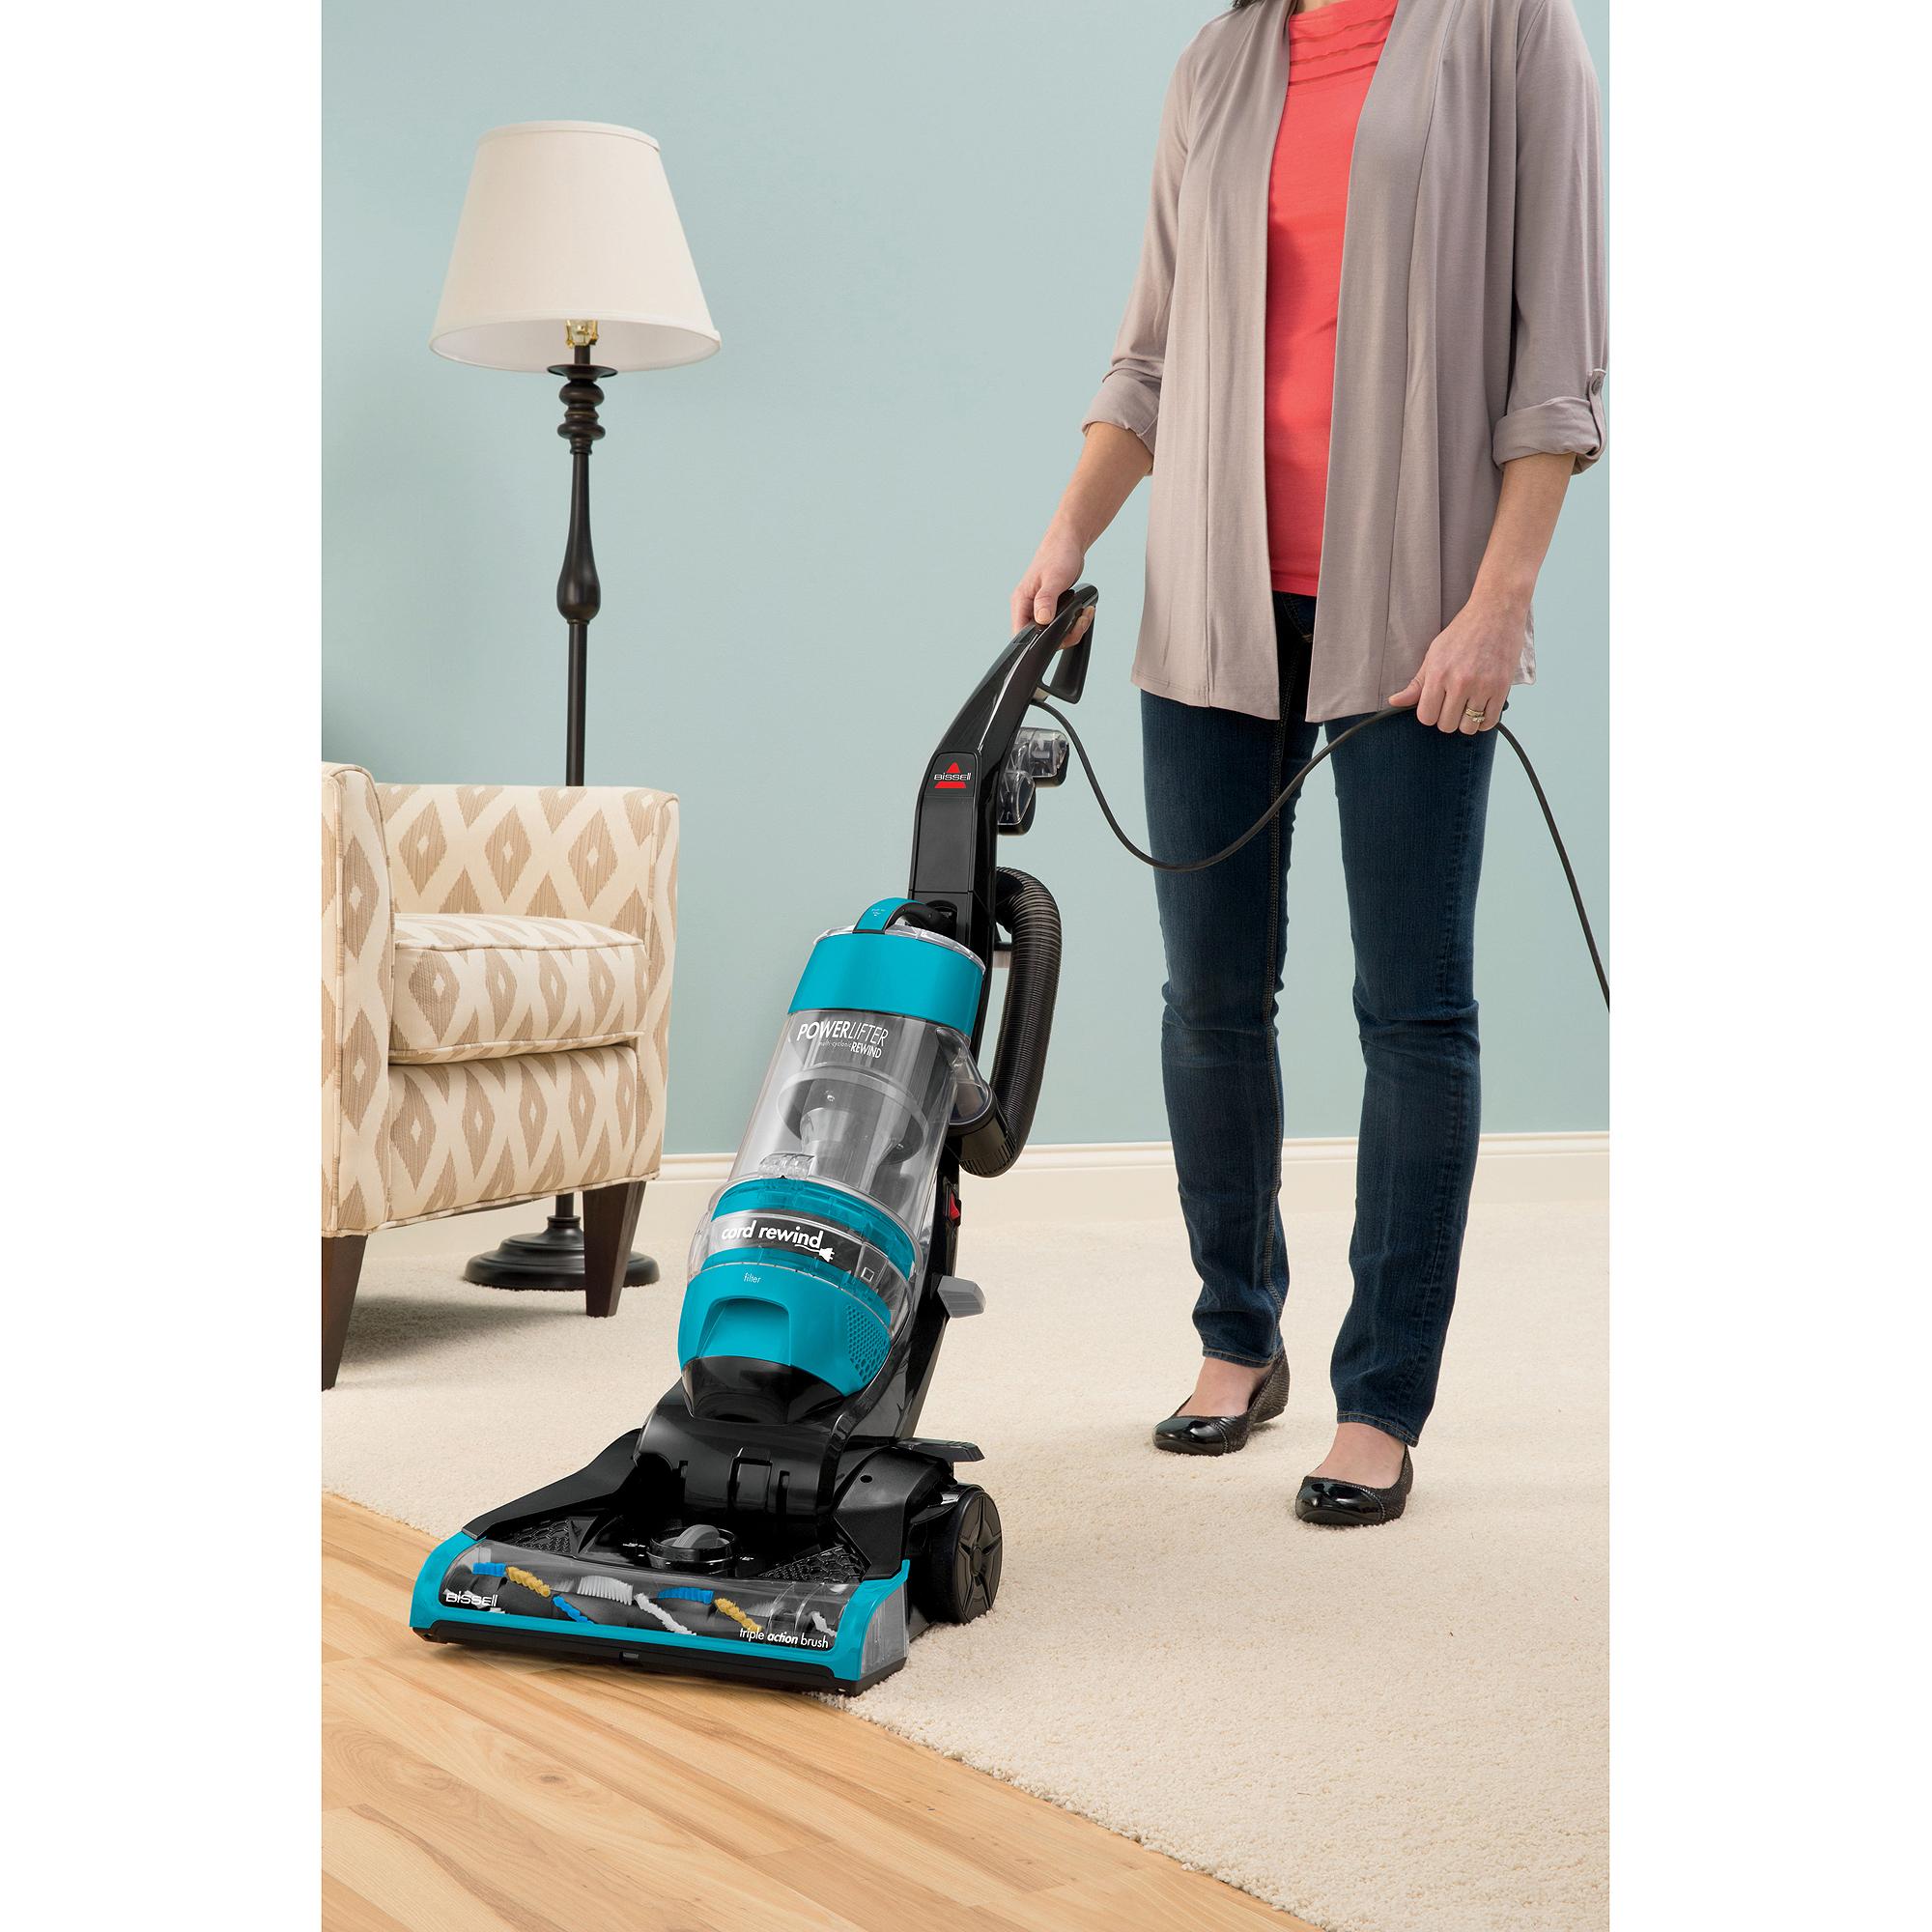 Bissell Powerlifter Rewind Bagless Vacuum, 1413 - Walmart com